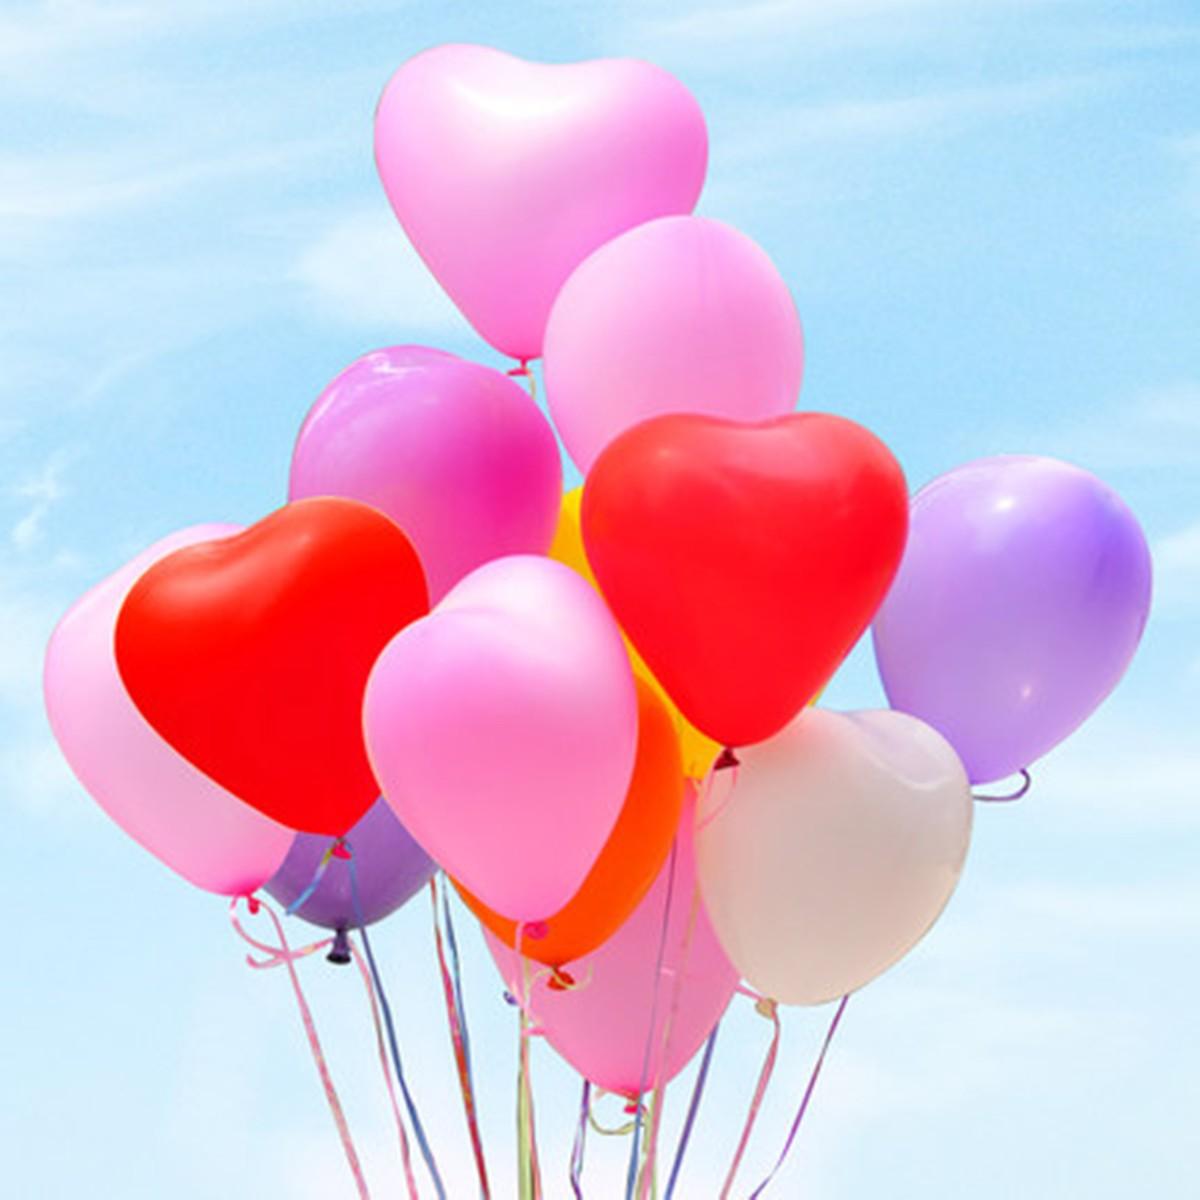 20pcs Love Heart Shape Balloon Balloons Romantic Valentine Proposal Wedding Party Decoration